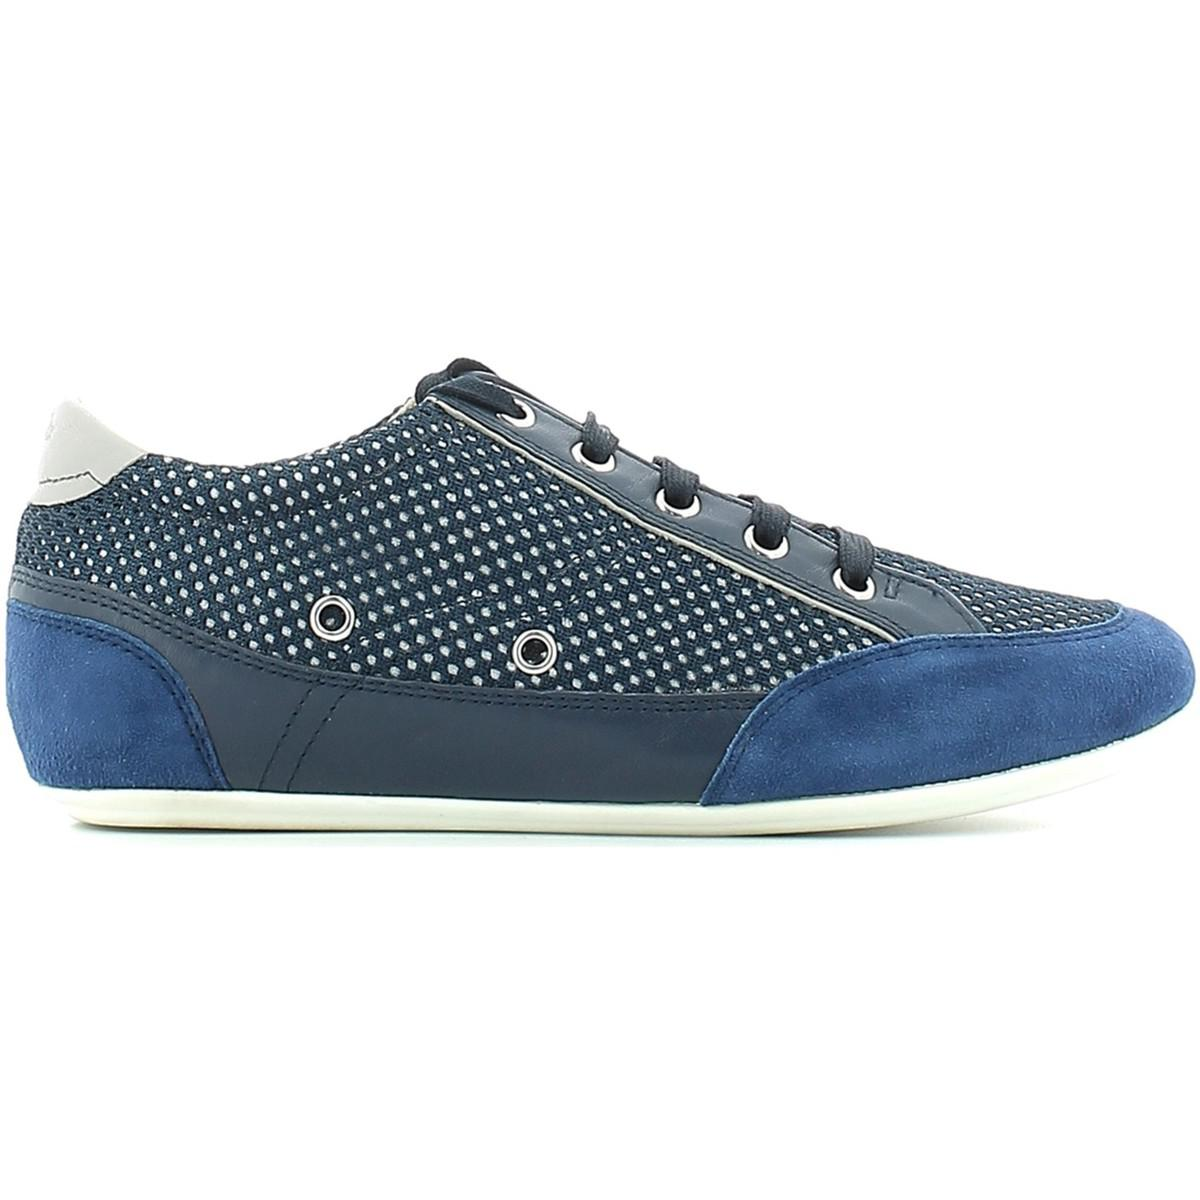 cfd24d972e3d2 Lumberjack 2728 M11 Sneakers Women Navy Blue/silver Women's Shoes ...